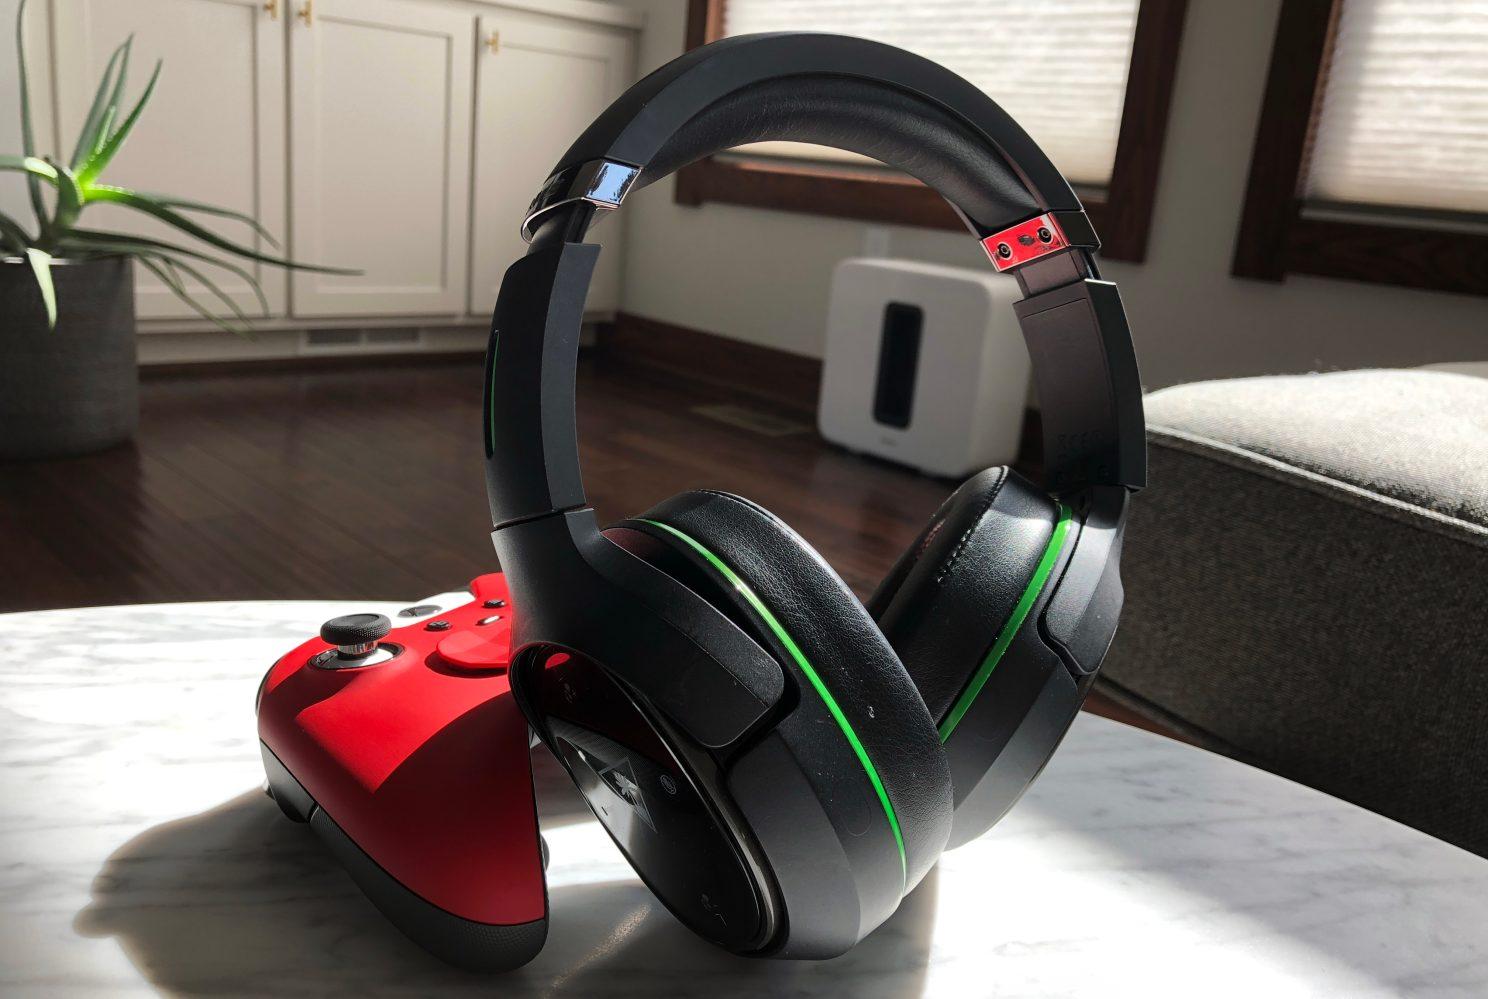 Turtle Beach's high-end Ear Force 800X Xbox One Headset hits